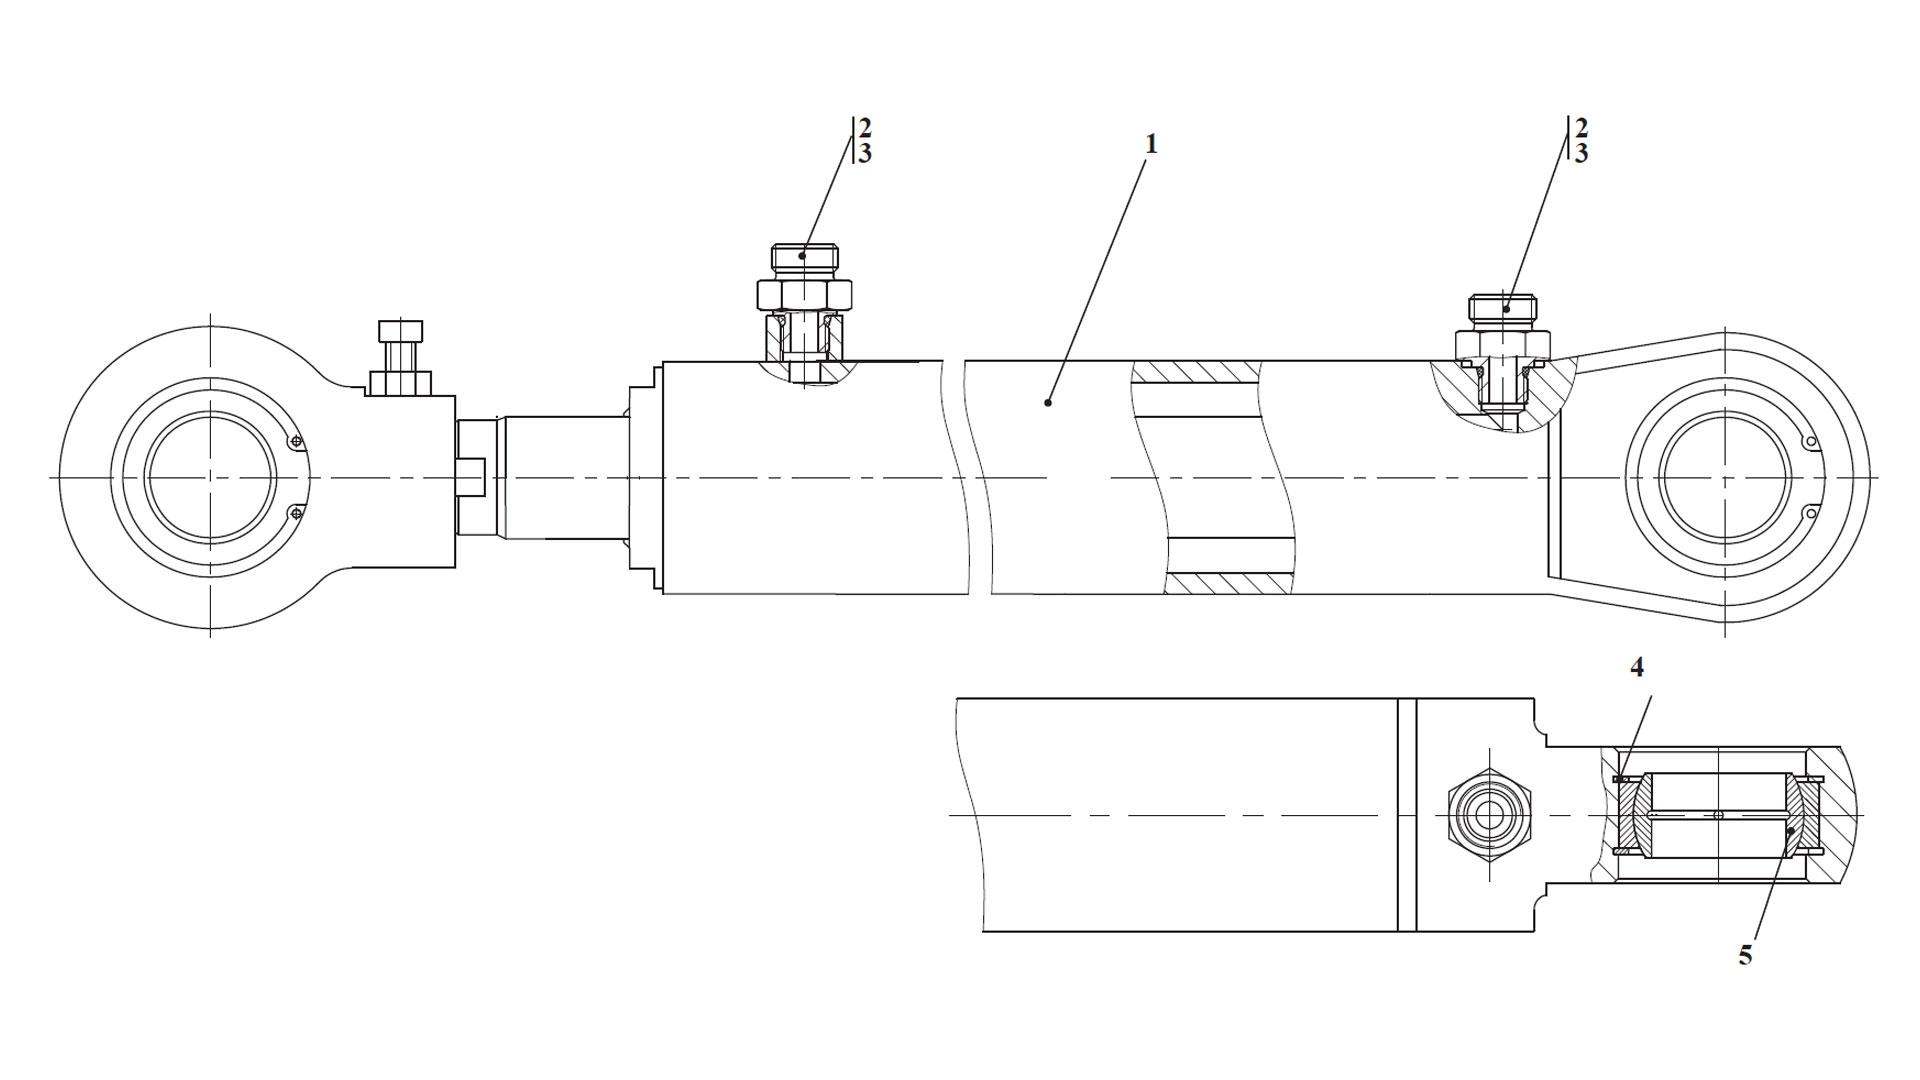 Гидроцилиндр поворота руля ТО-28А.78.08.000